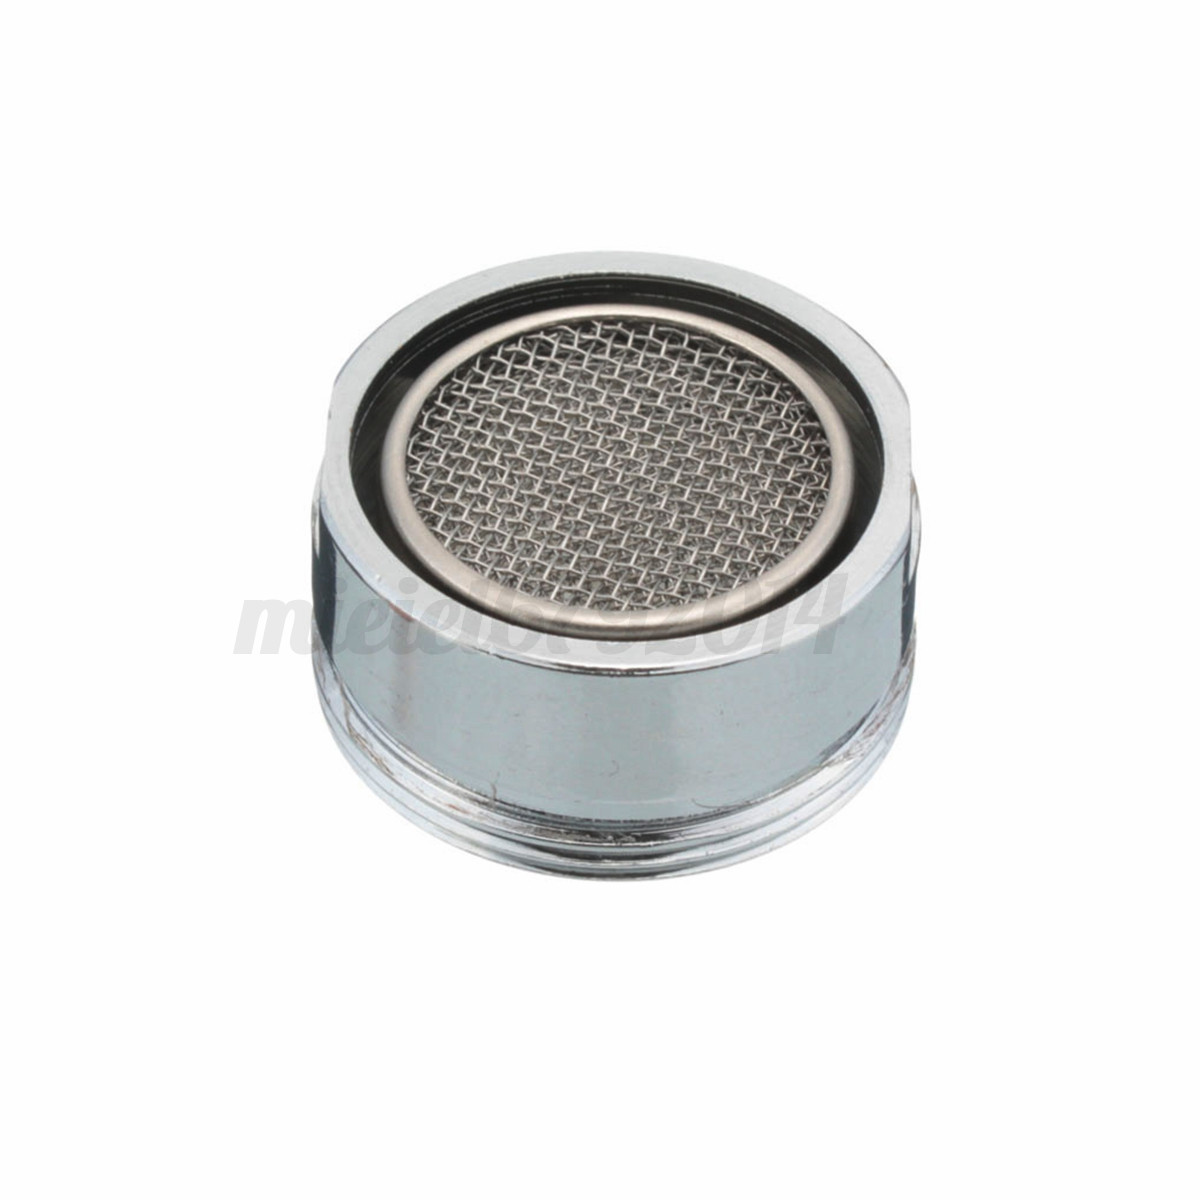 24mm Kitchen Basin Tap Aerator Nozzle Chrome Male Spout